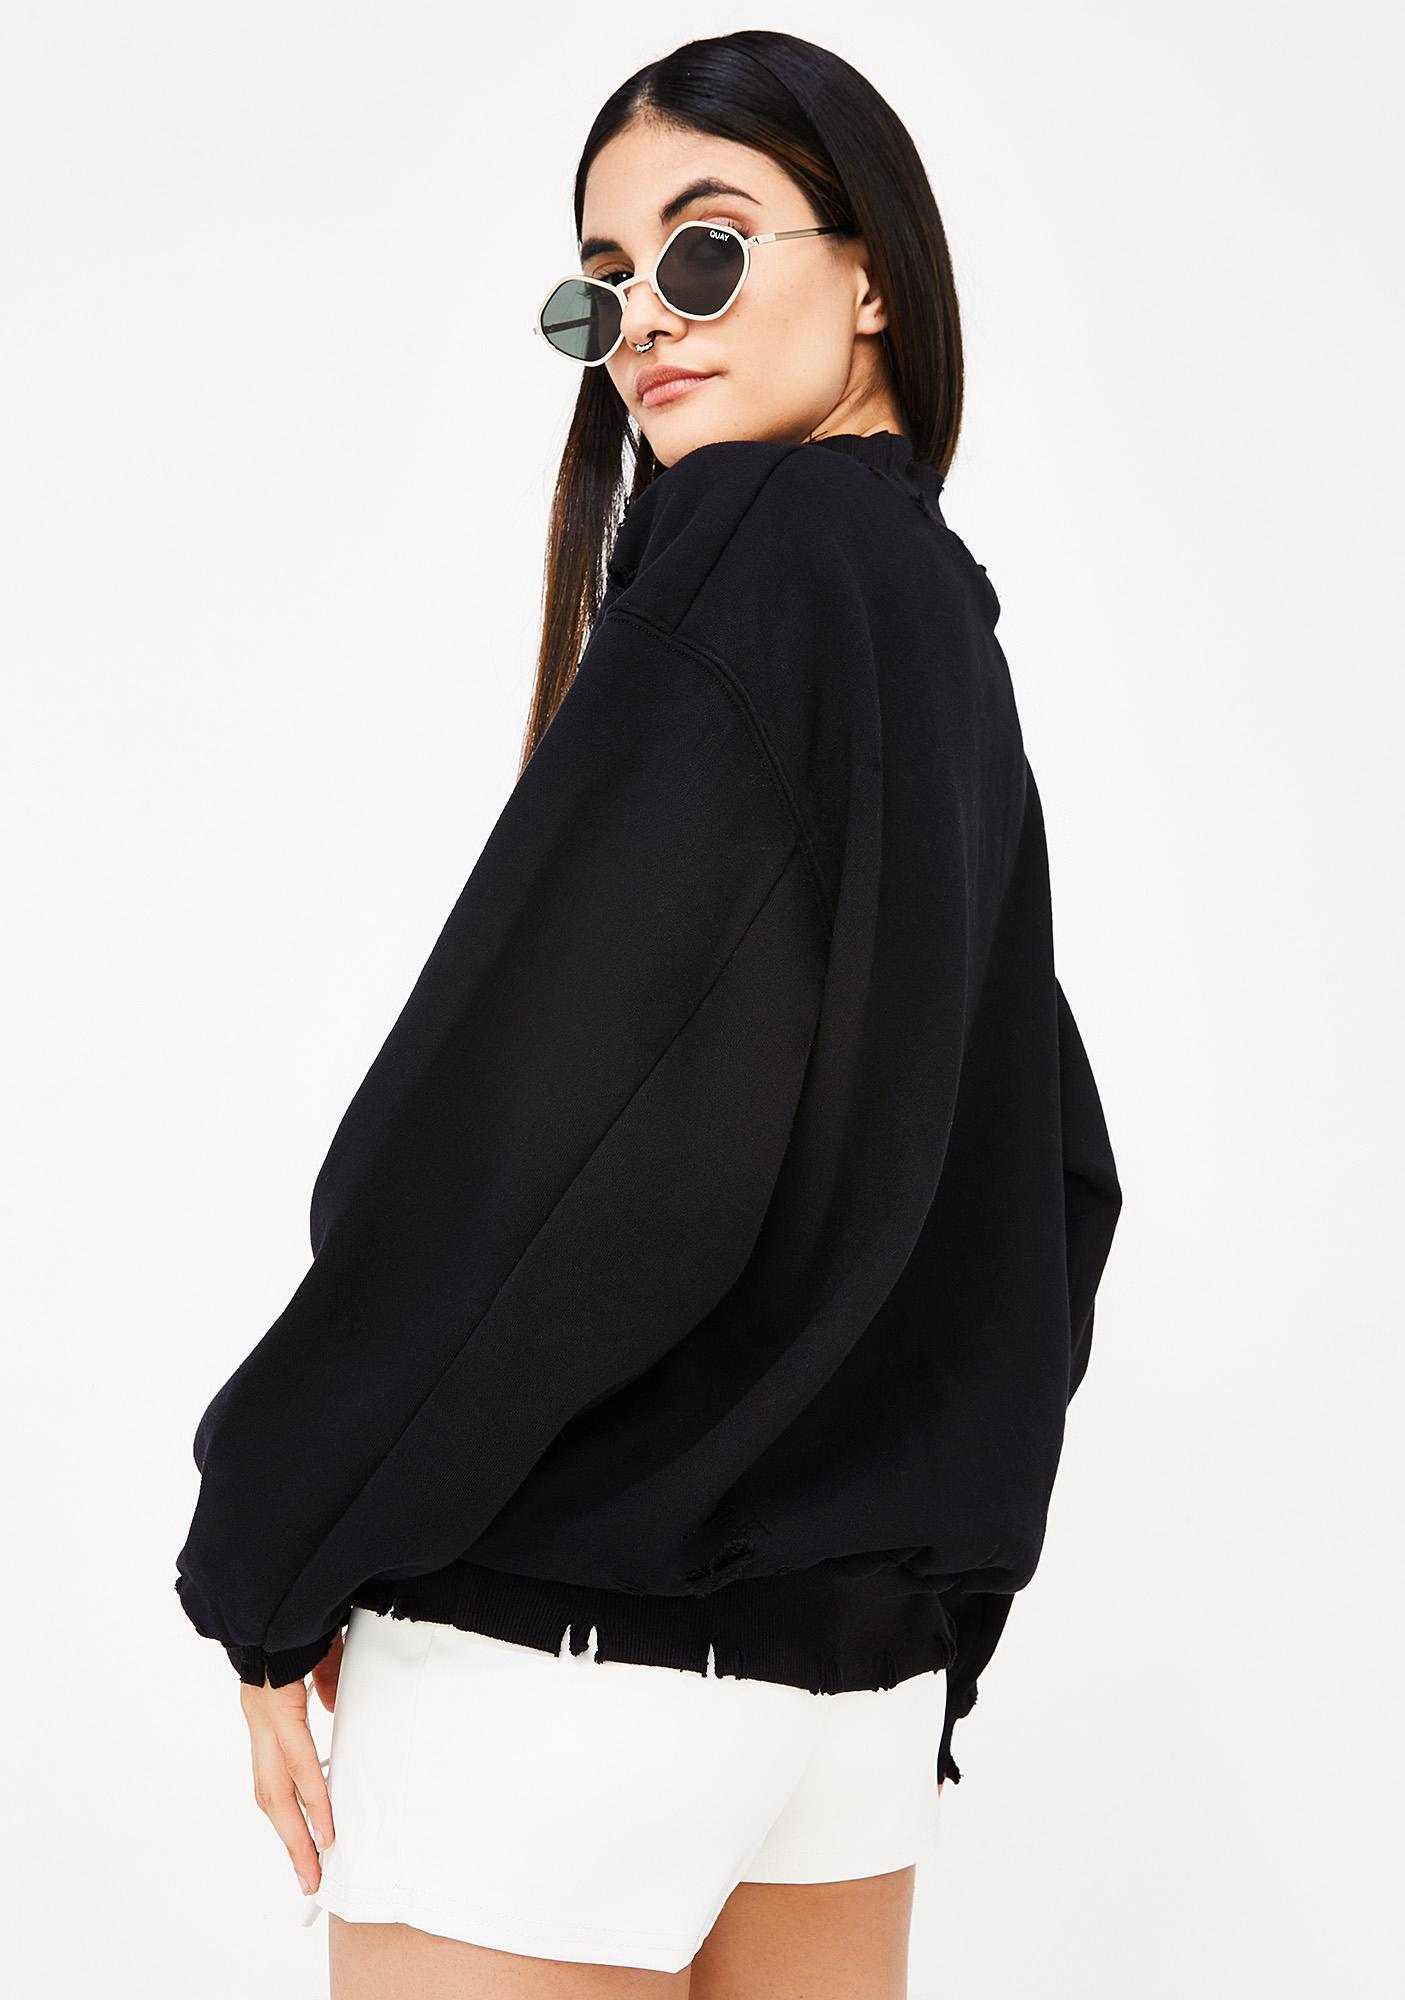 Onyx Fade Away Distressed Sweatshirt